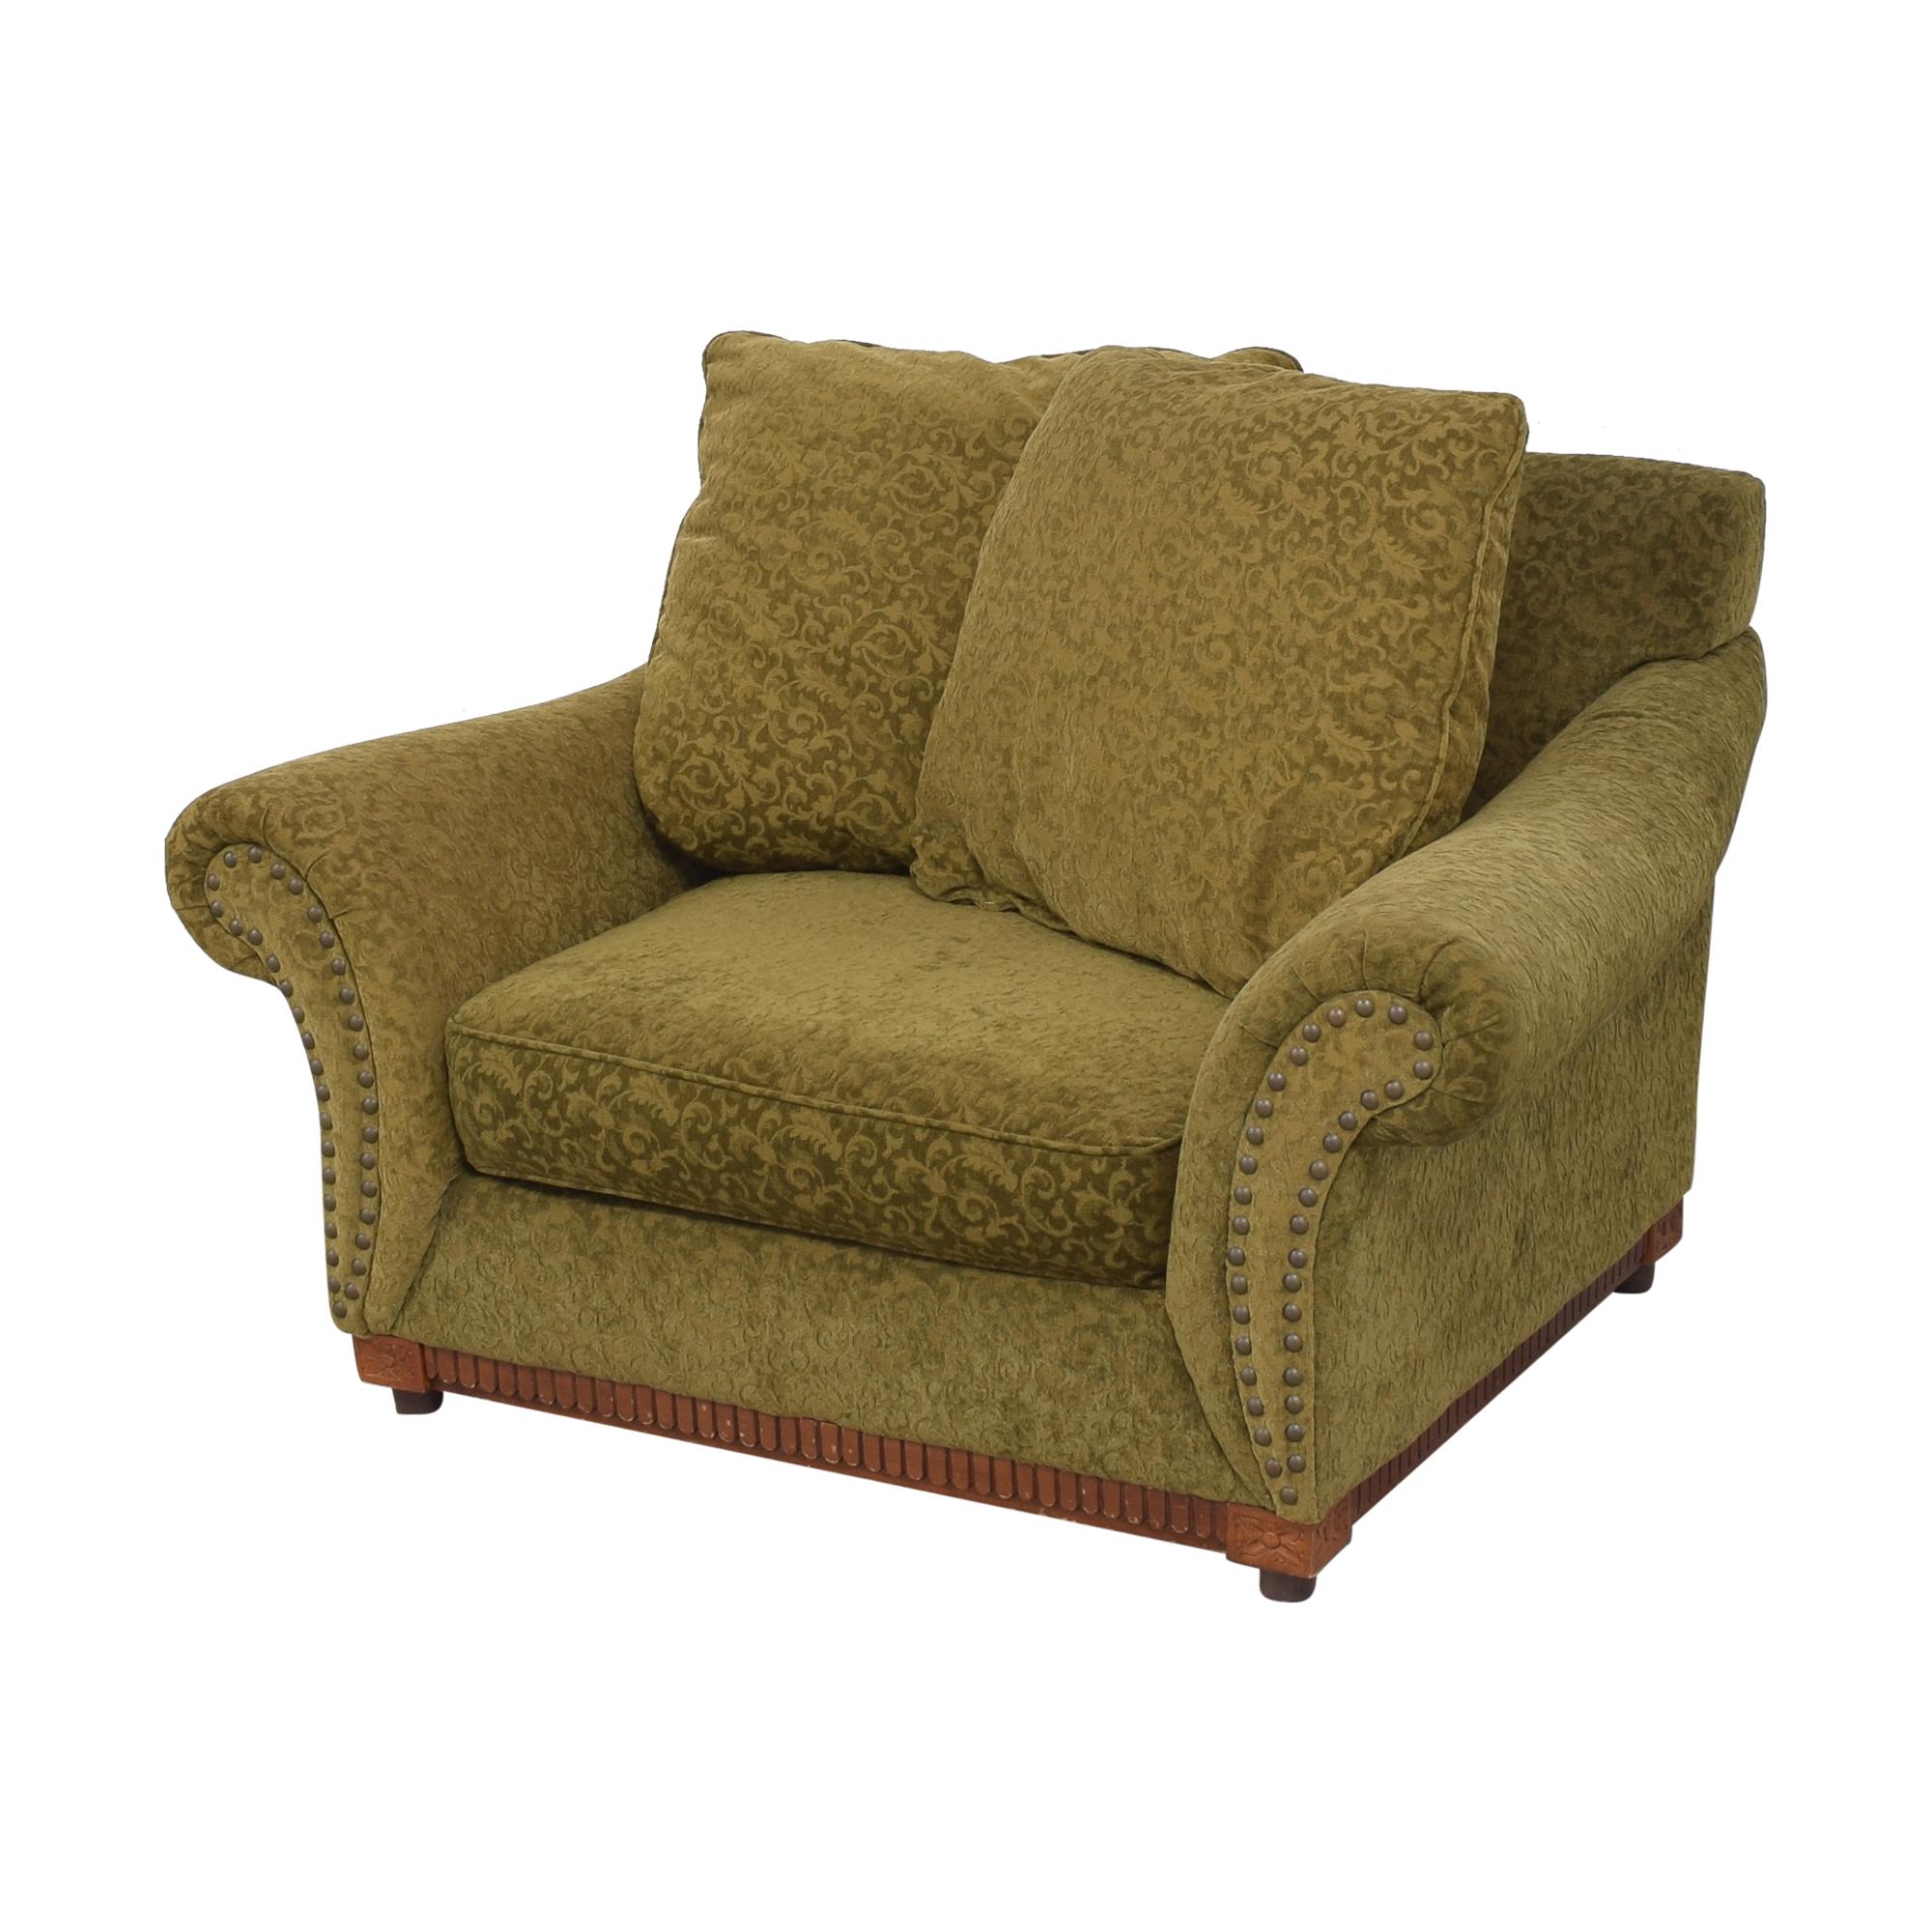 Bauhaus Furniture Bauhaus Accent Armchair ct